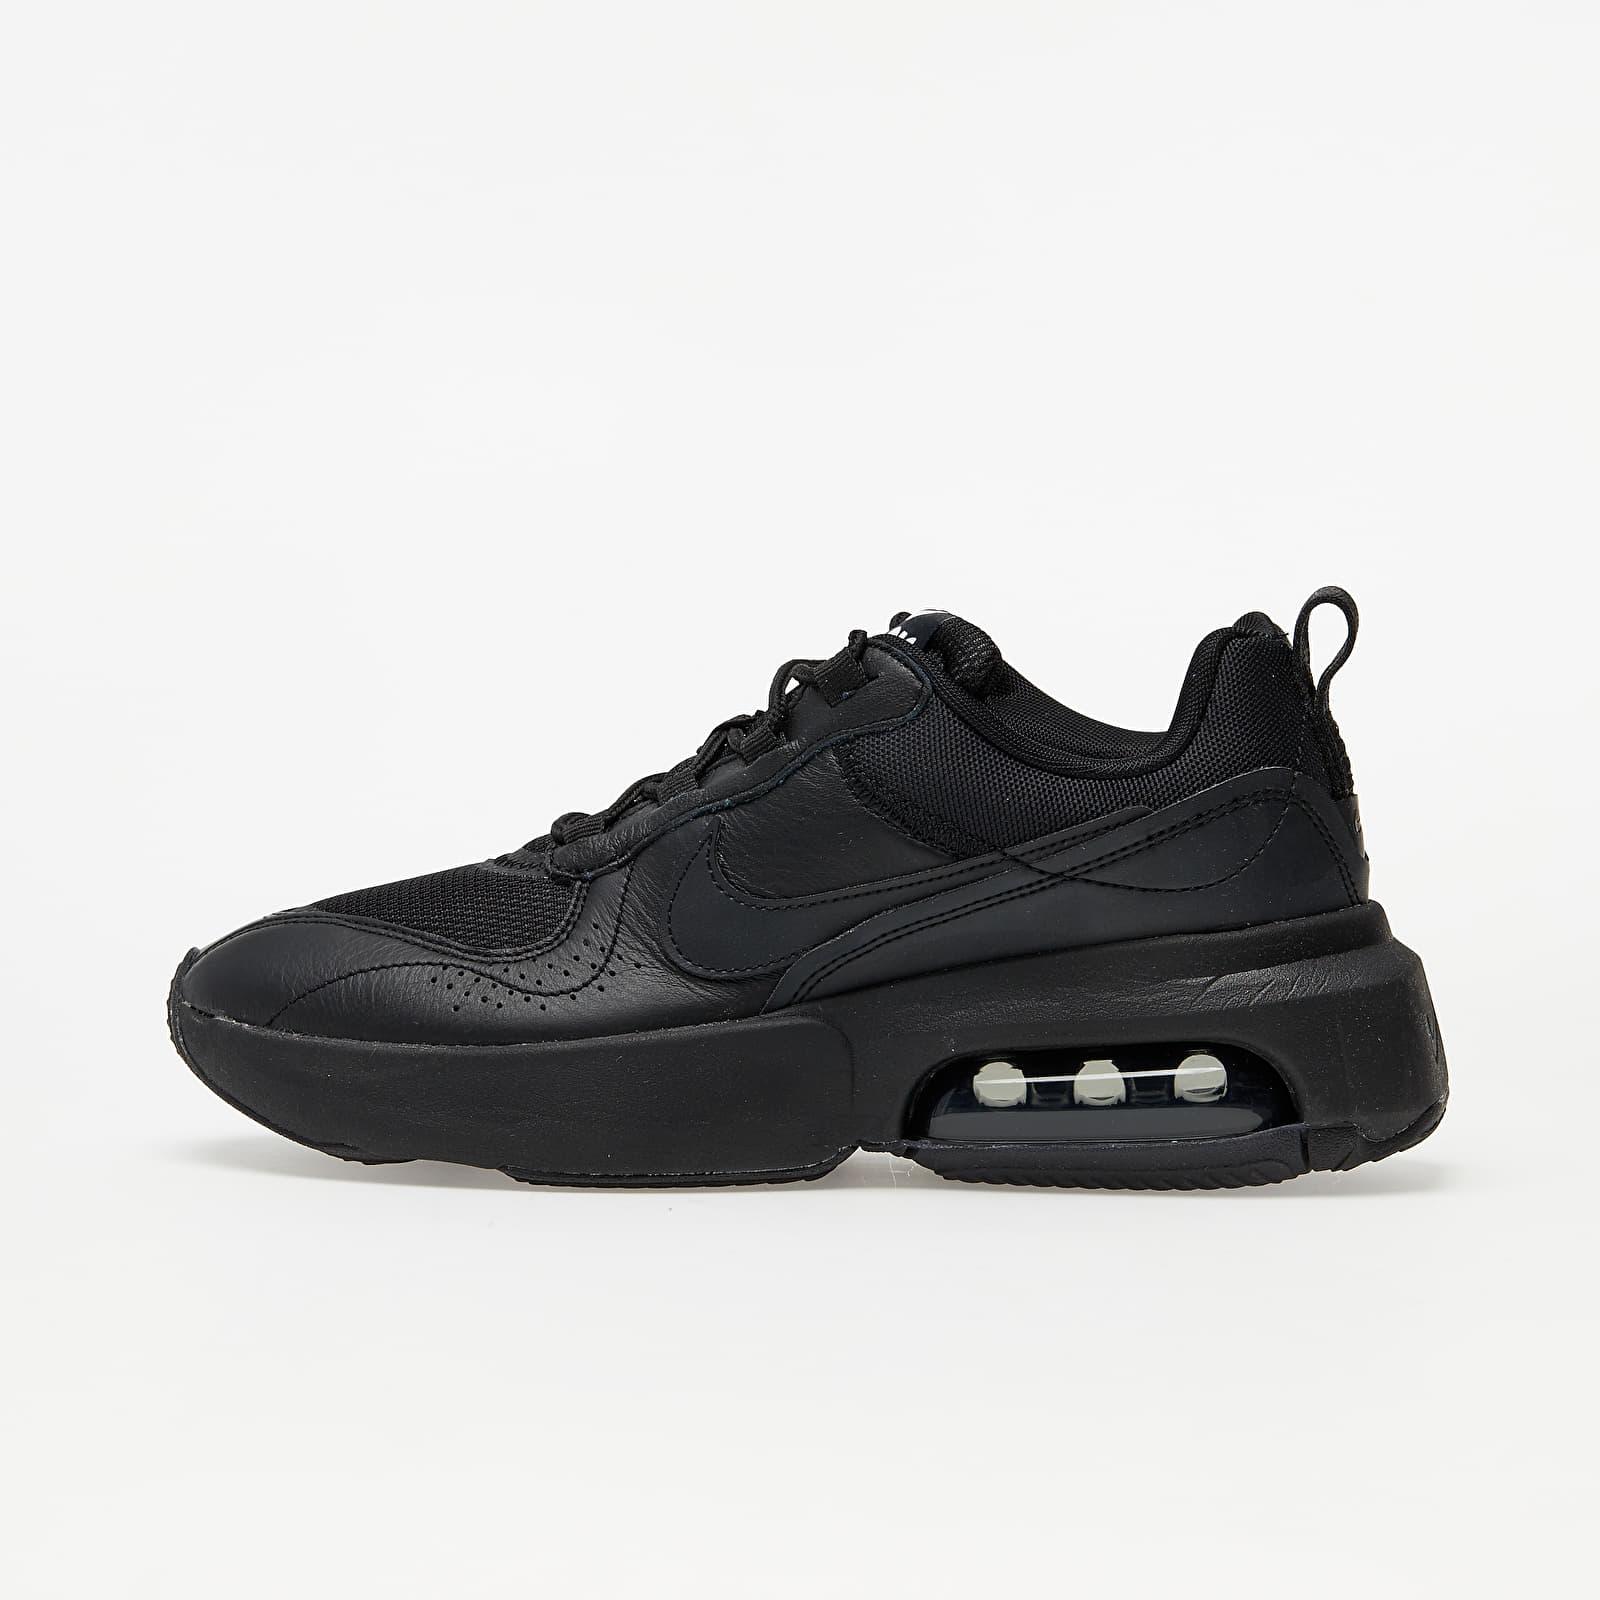 Nike W Air Max Verona Black/ Black-Metallic Silver EUR 40